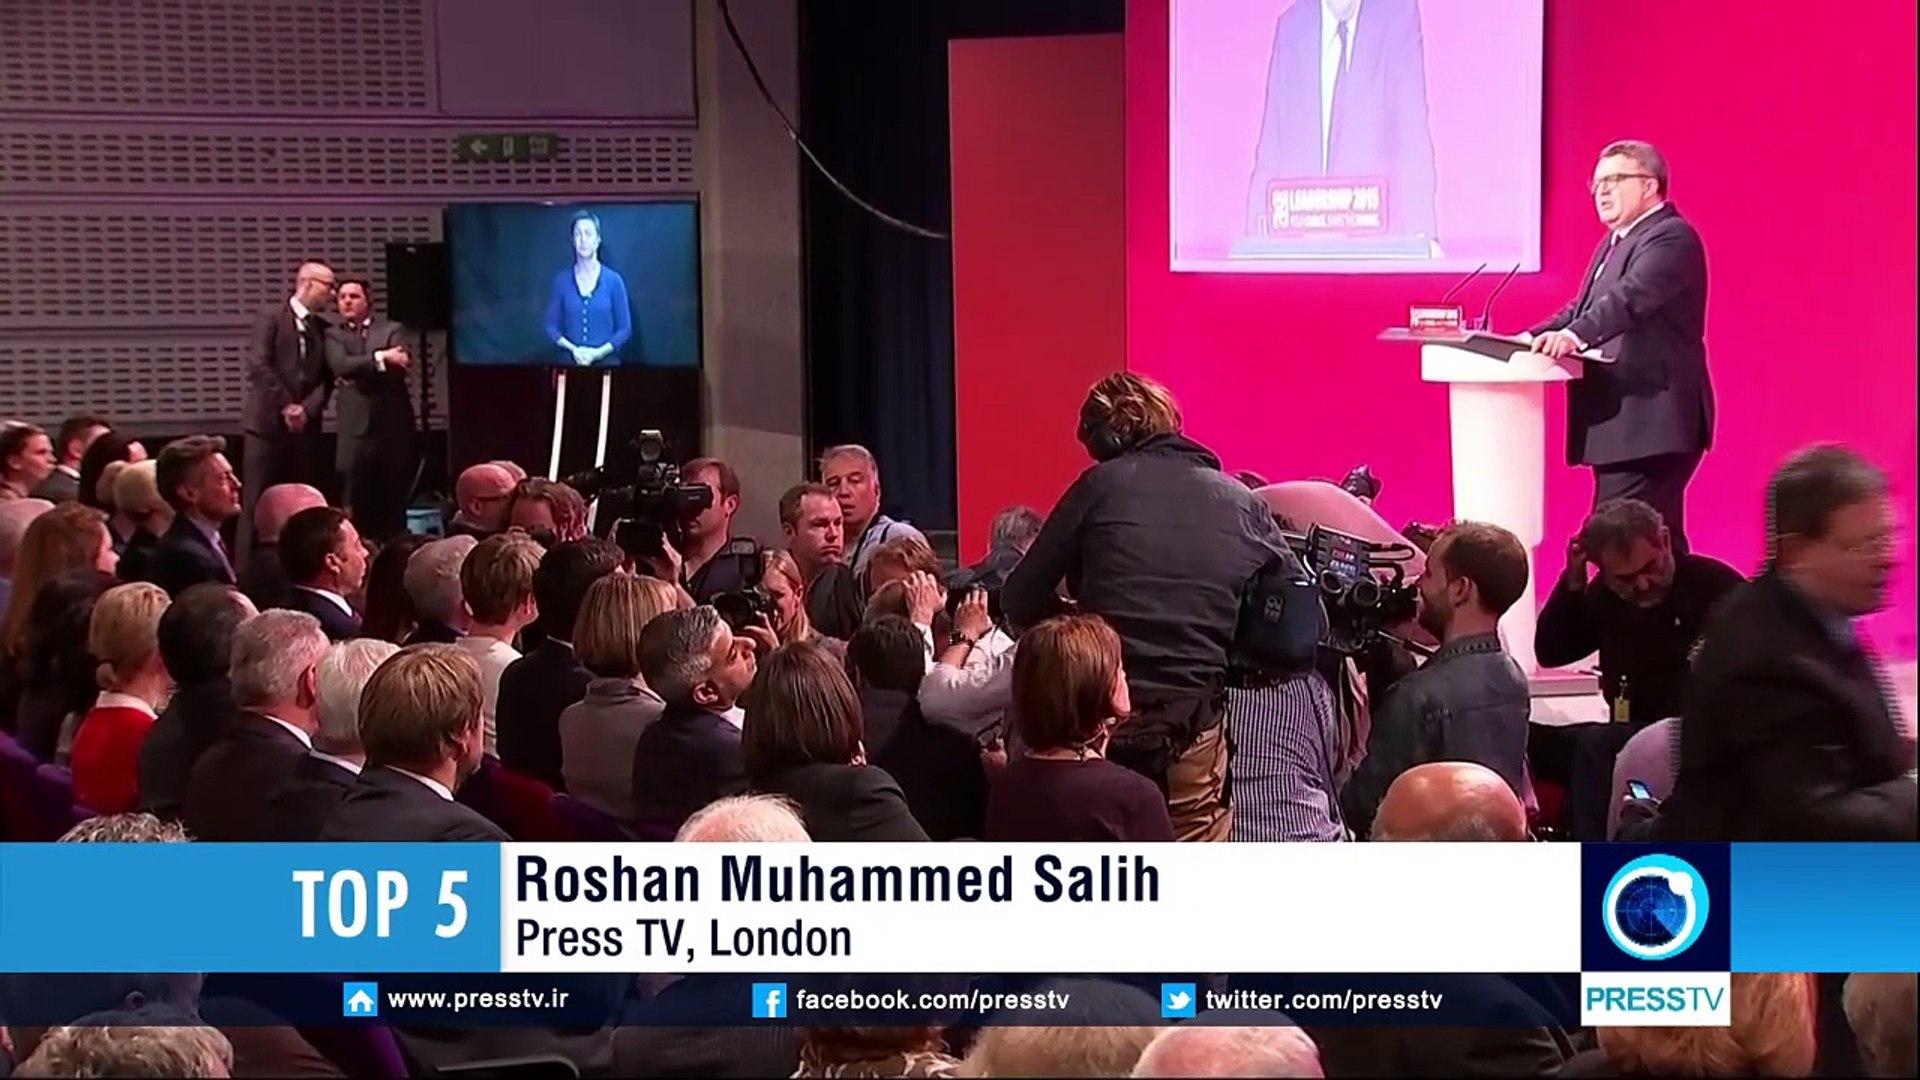 UK defense secretary: Labour under Corbyn 'national security threat'